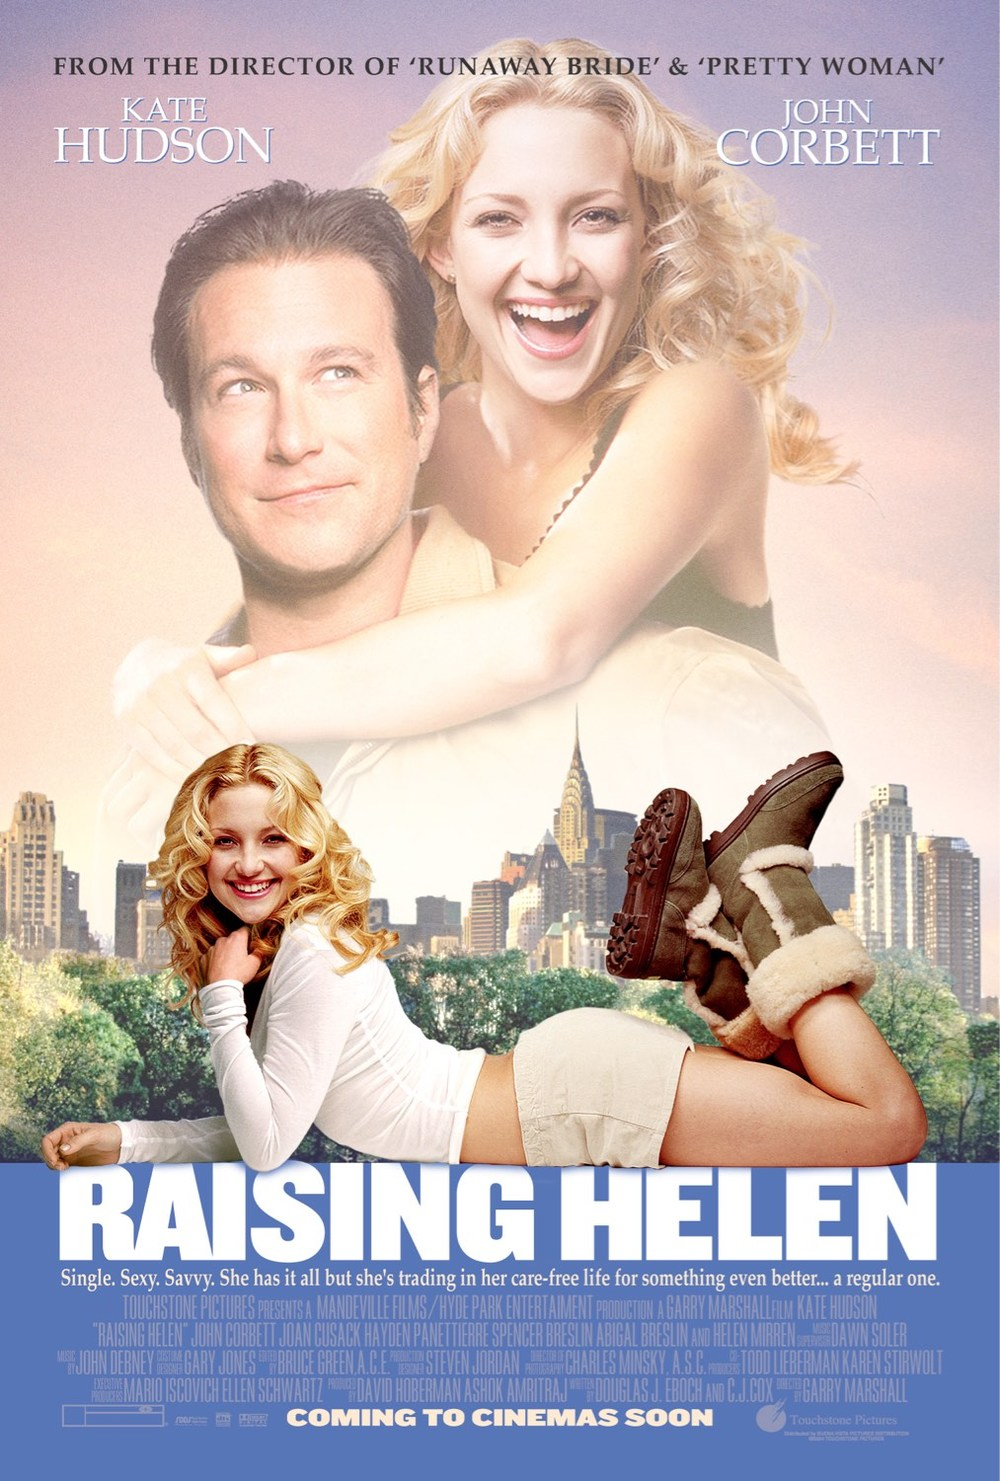 RAISING HELEN INT'L.jpg